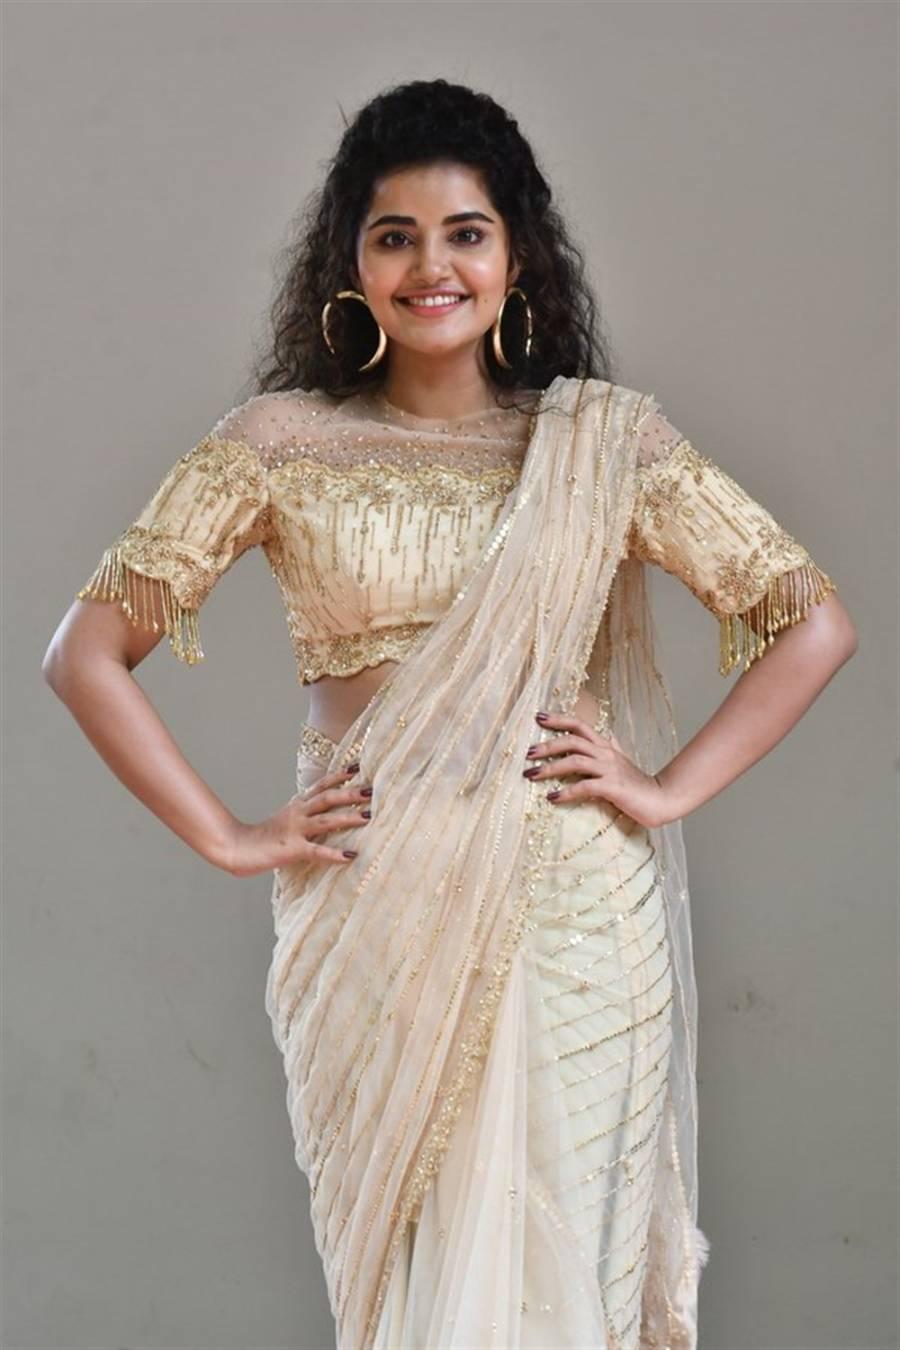 Anupama Parameswaran at Rakshasudu Movie Press Meet